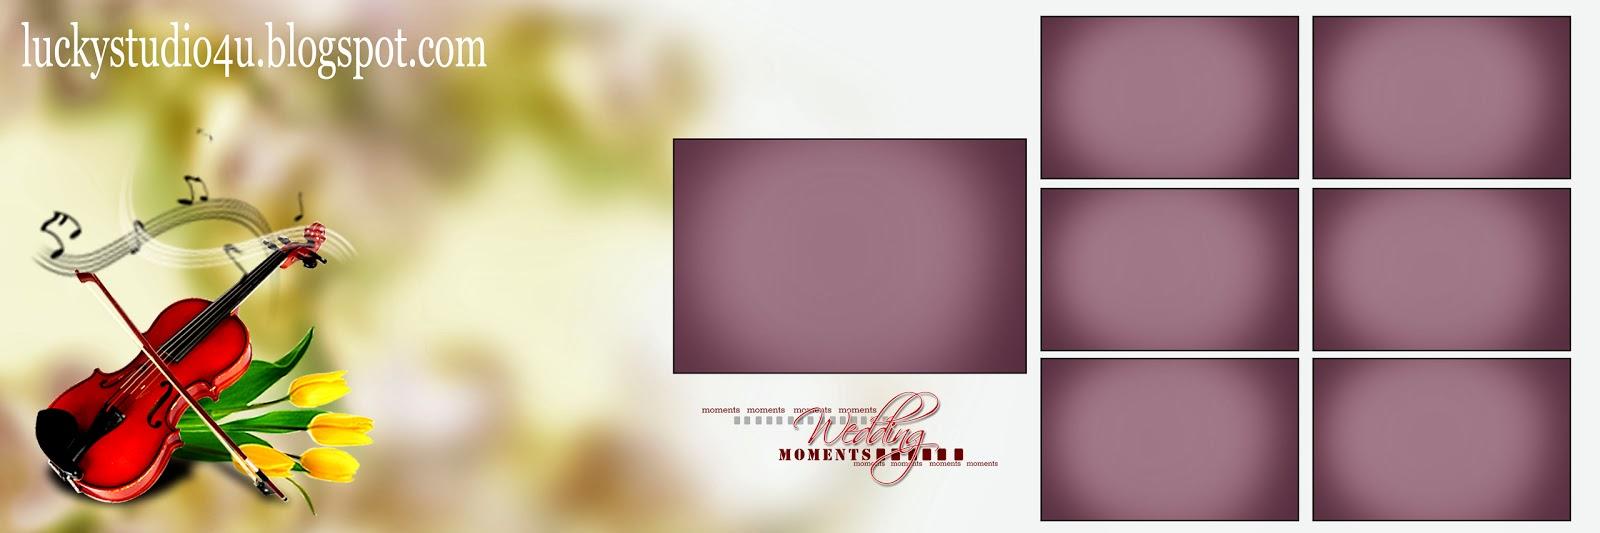 Free Online Photo Design Software